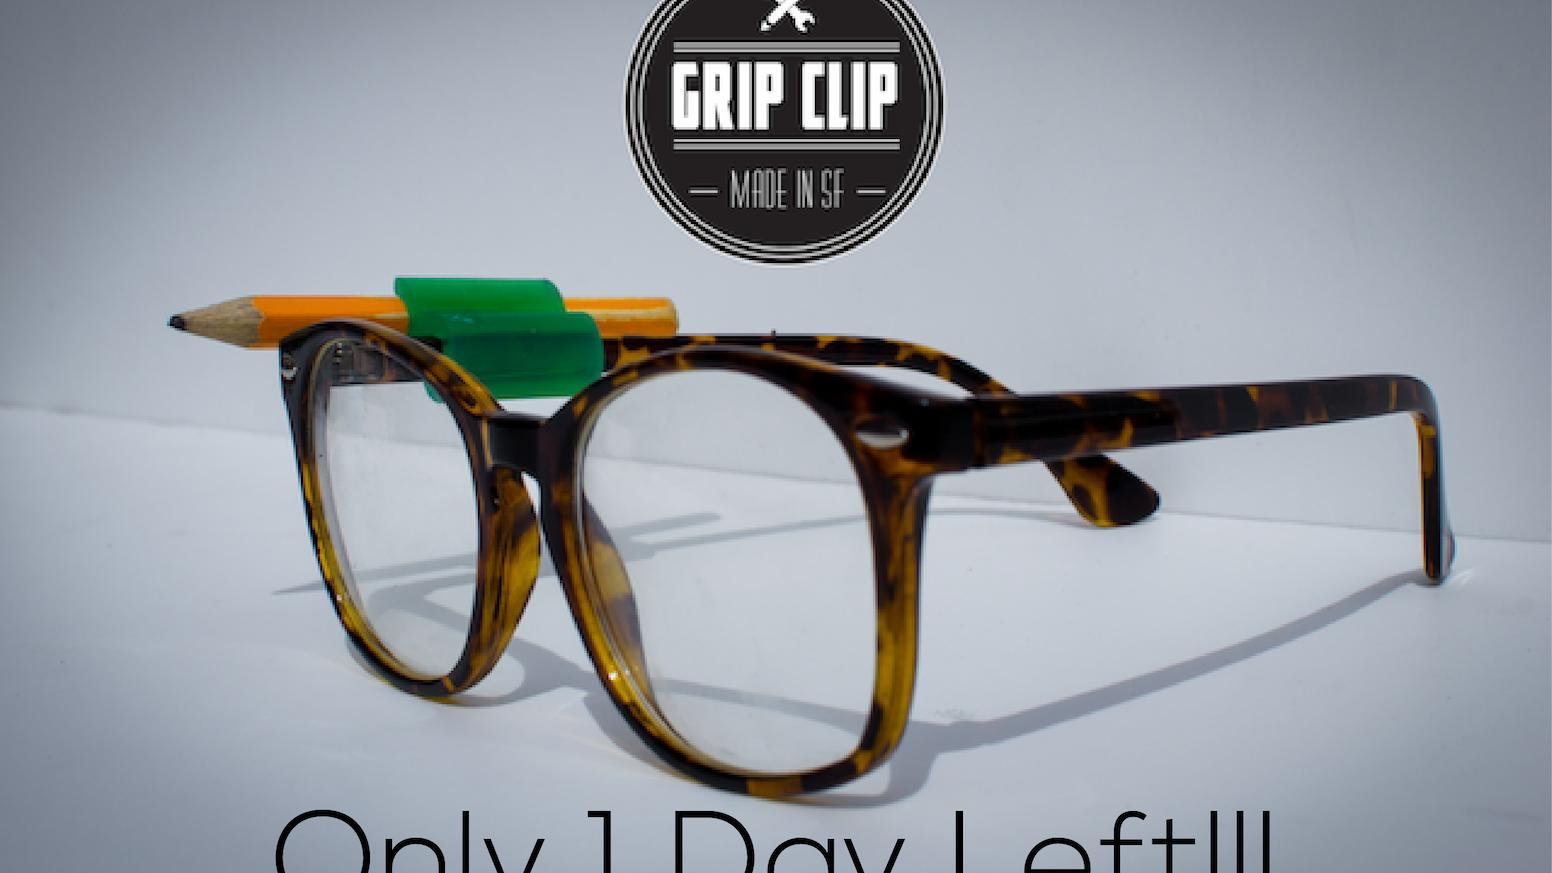 Grip Clip: Pencil Hero by Atticus Anderson and Blake Crowe